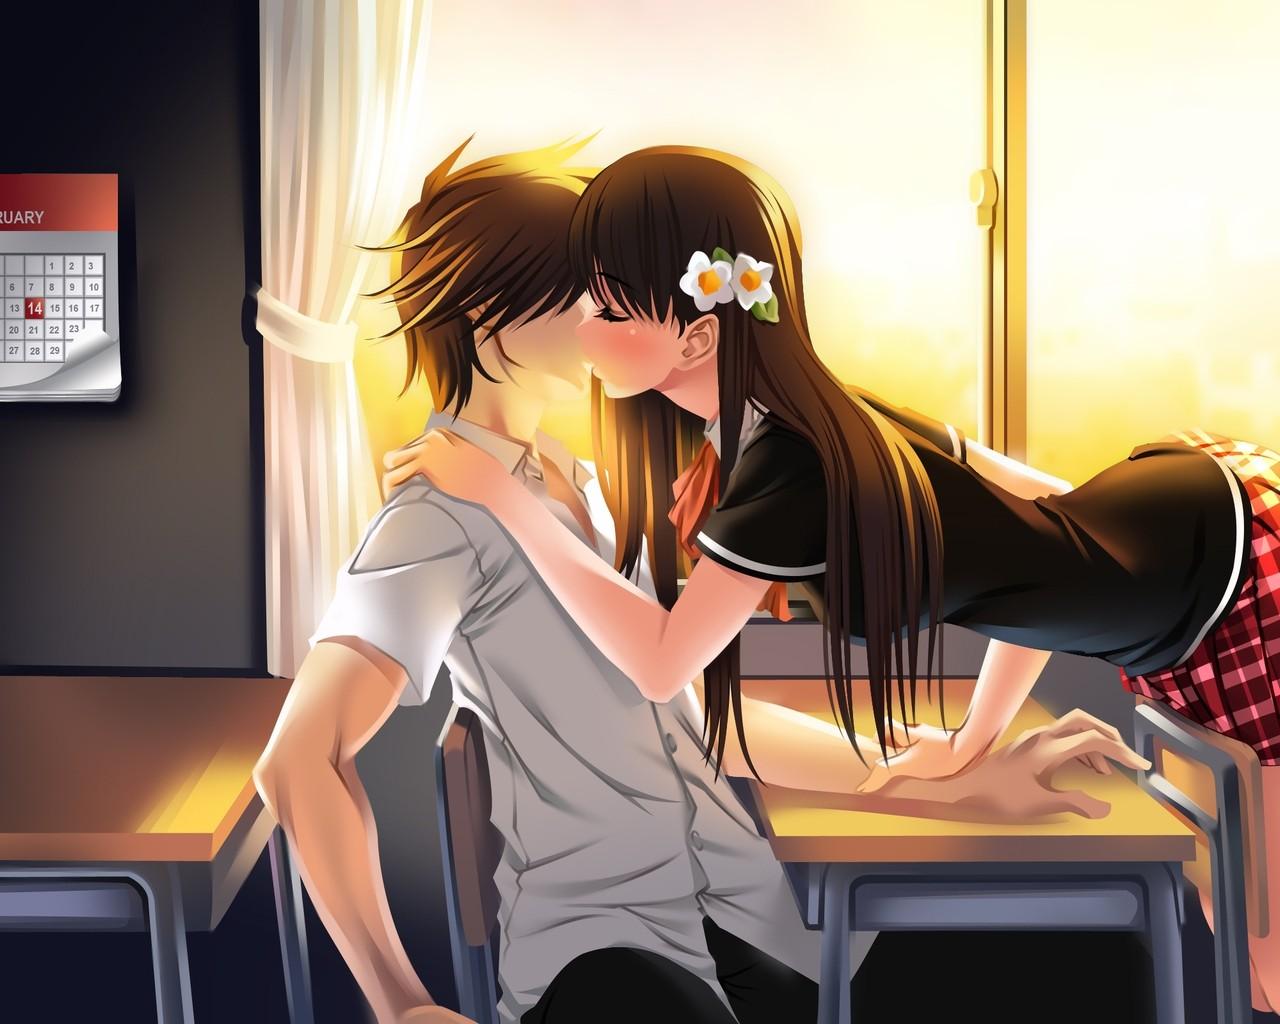 Illustration Anime Cartoon Black Hair School Kissing Mangaka Interaction